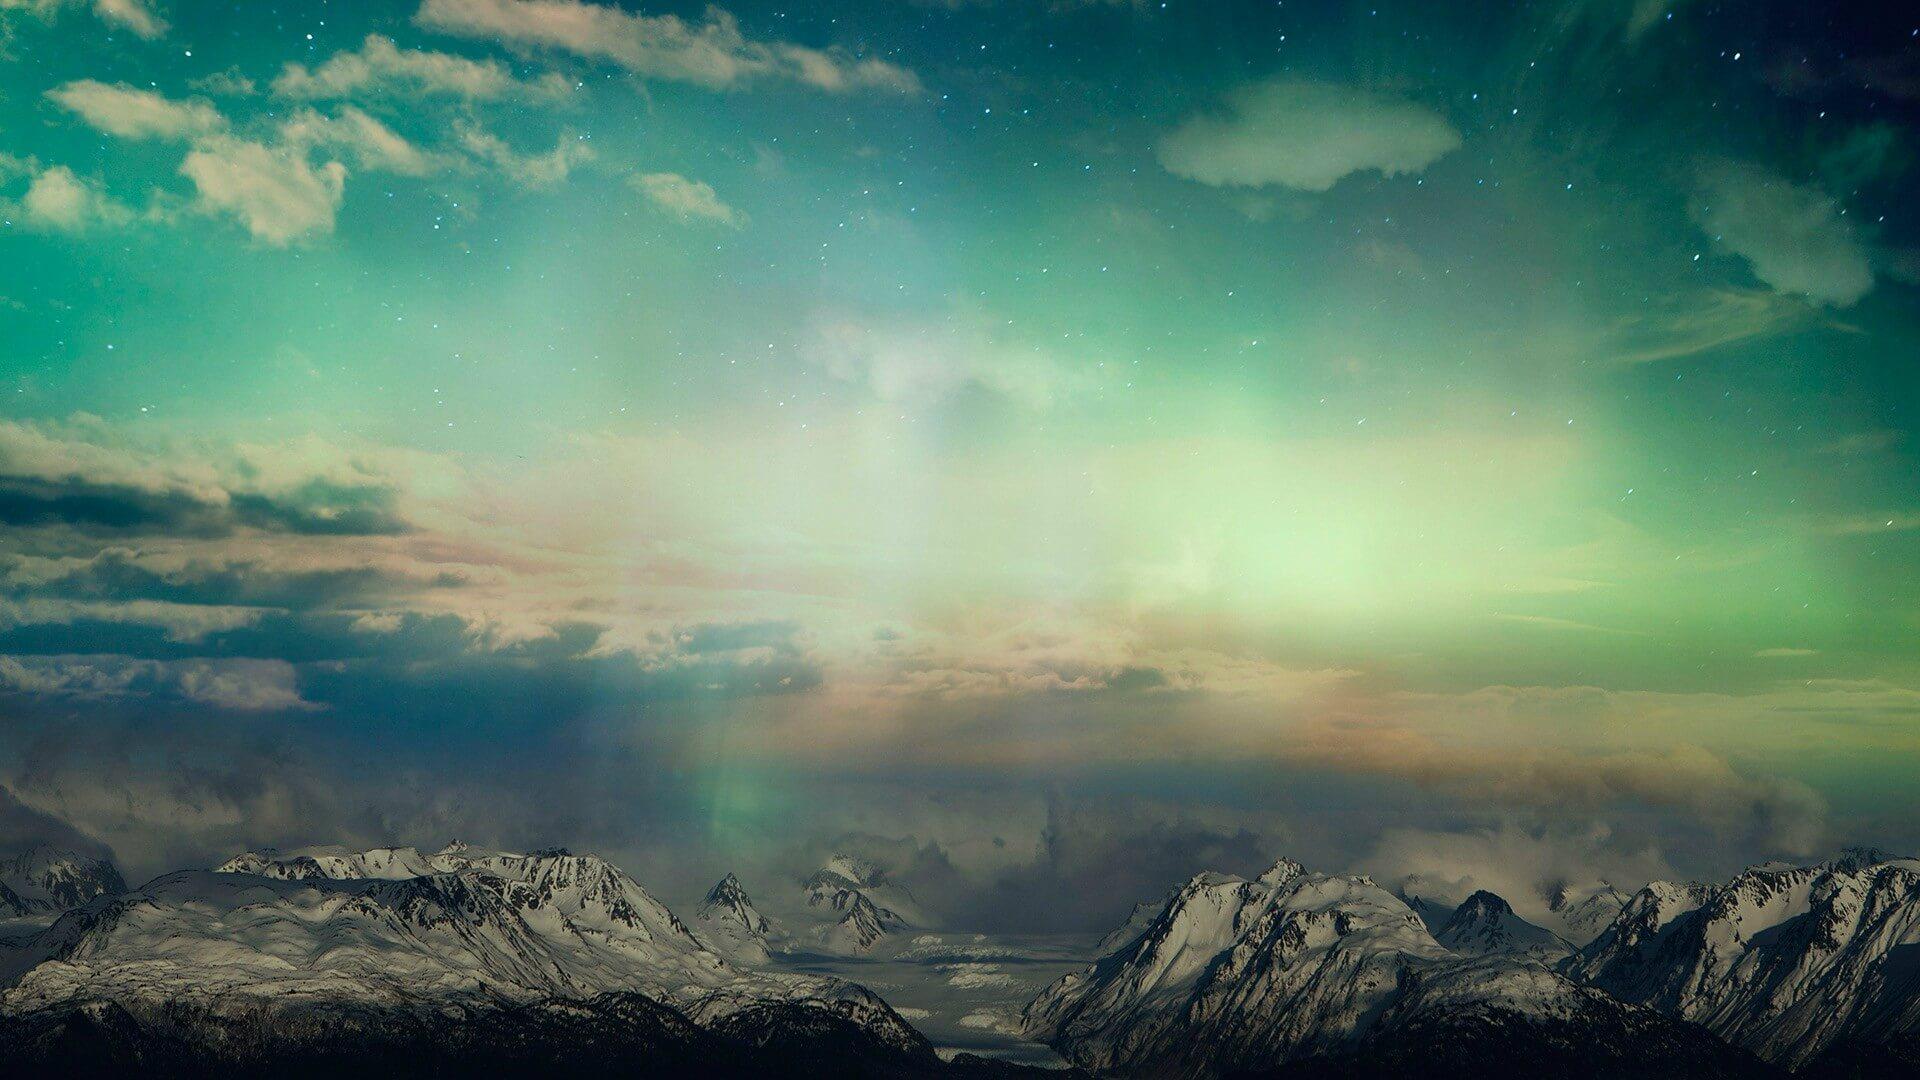 lock screen wallpaper,sky,nature,cloud,atmosphere,atmospheric phenomenon